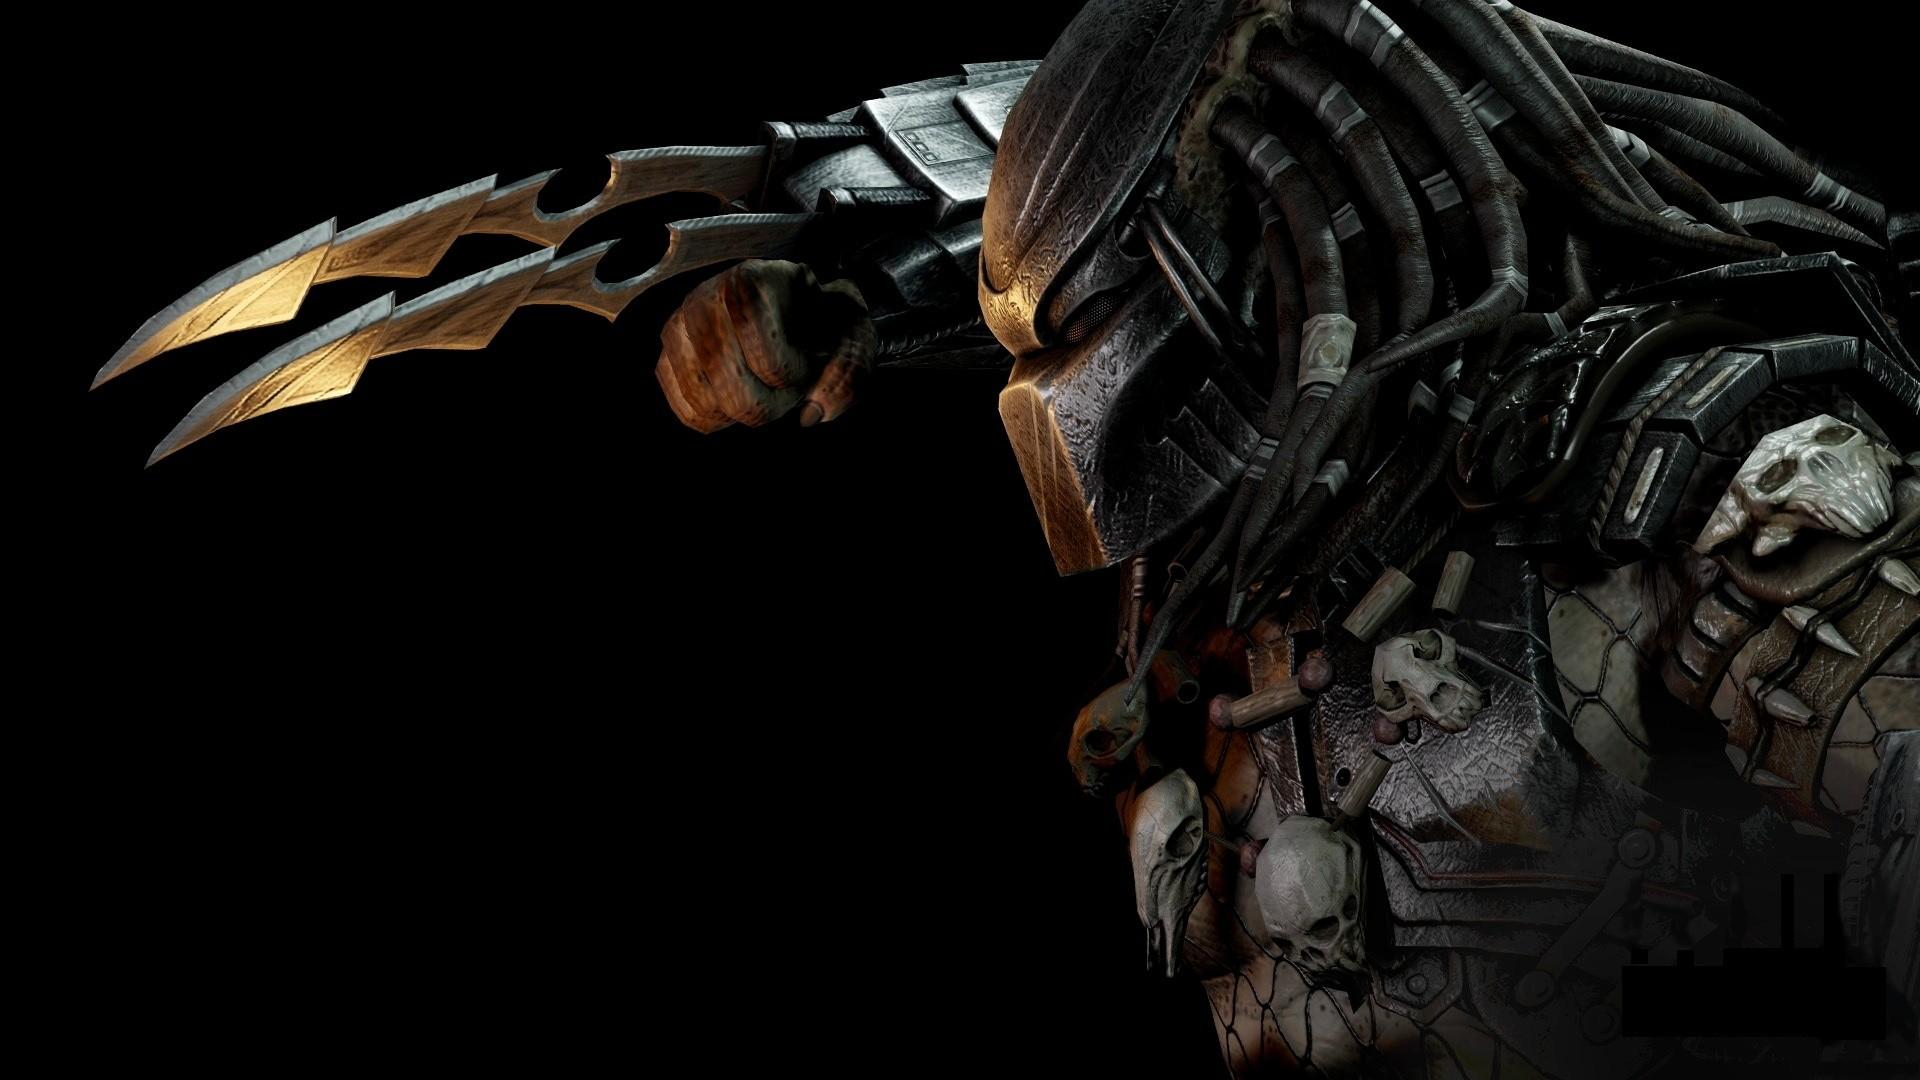 predator, aliens vs predator movie - free wallpaper / wallpaperjam